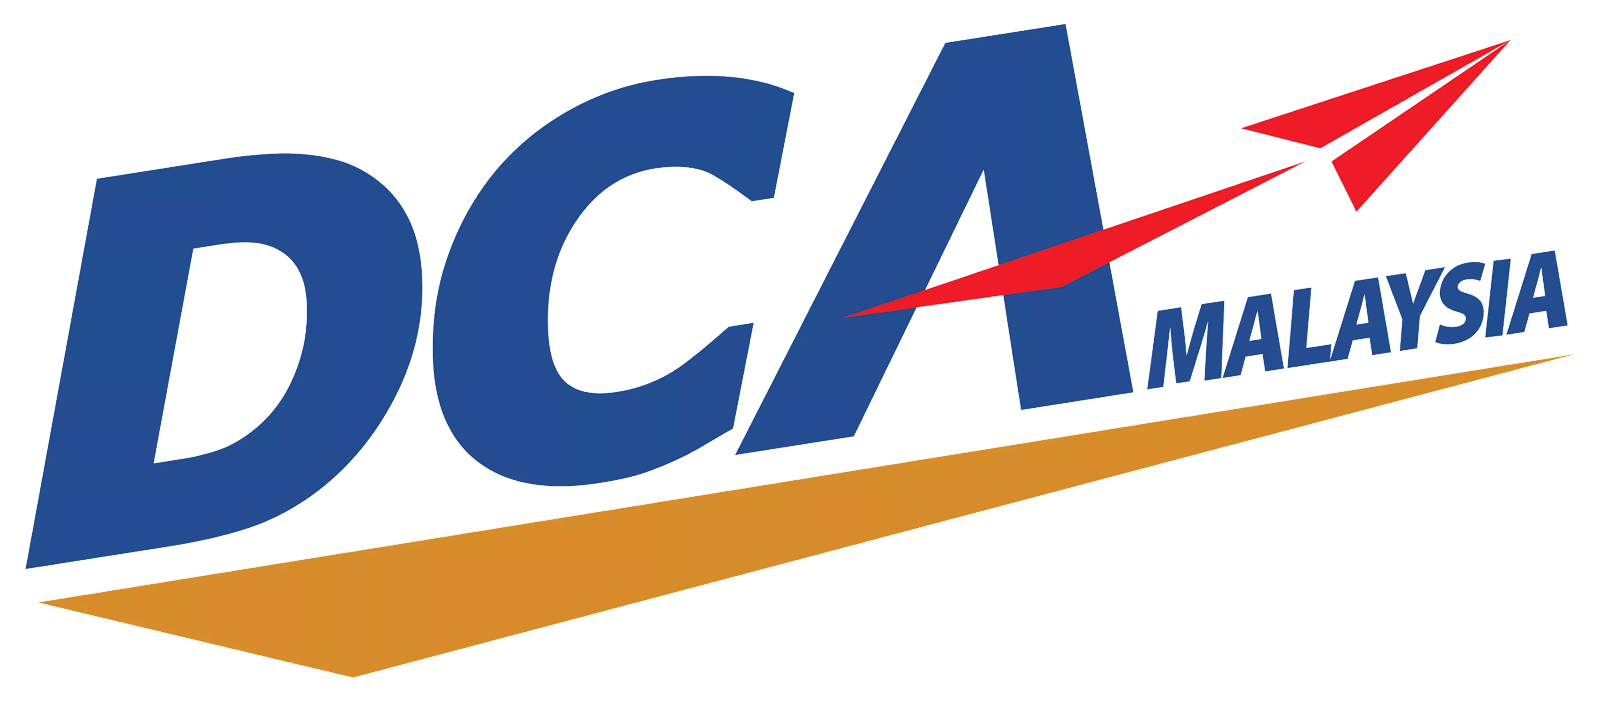 Logo Soalan Peperiksaan Pegawai Kawalan Trafik Udara